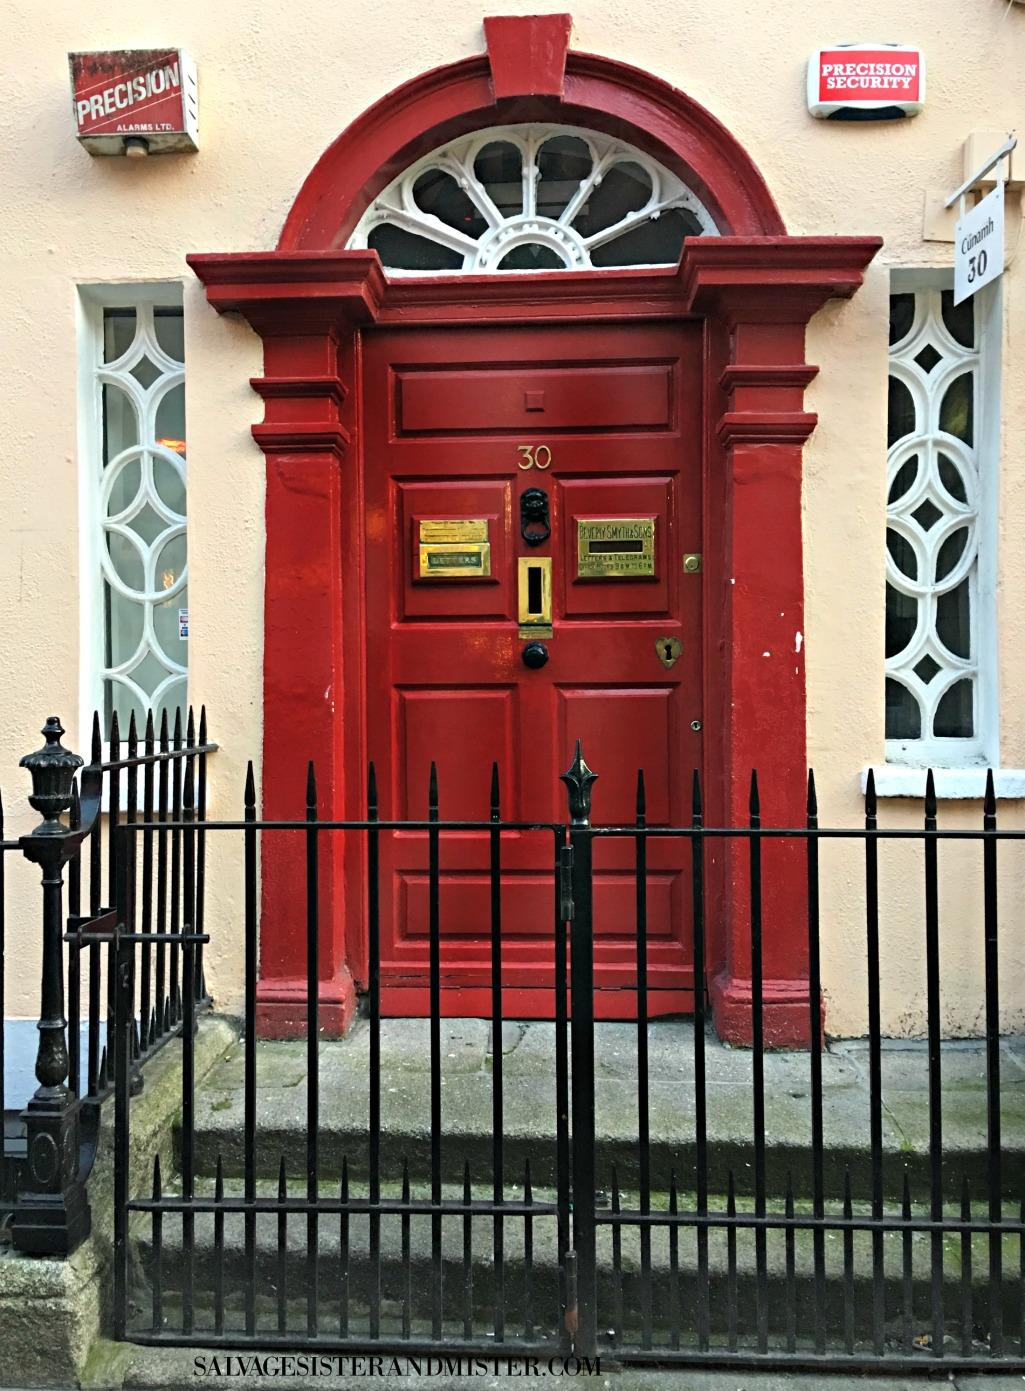 traveling - doors of ireland on salvagesisterandmister.com